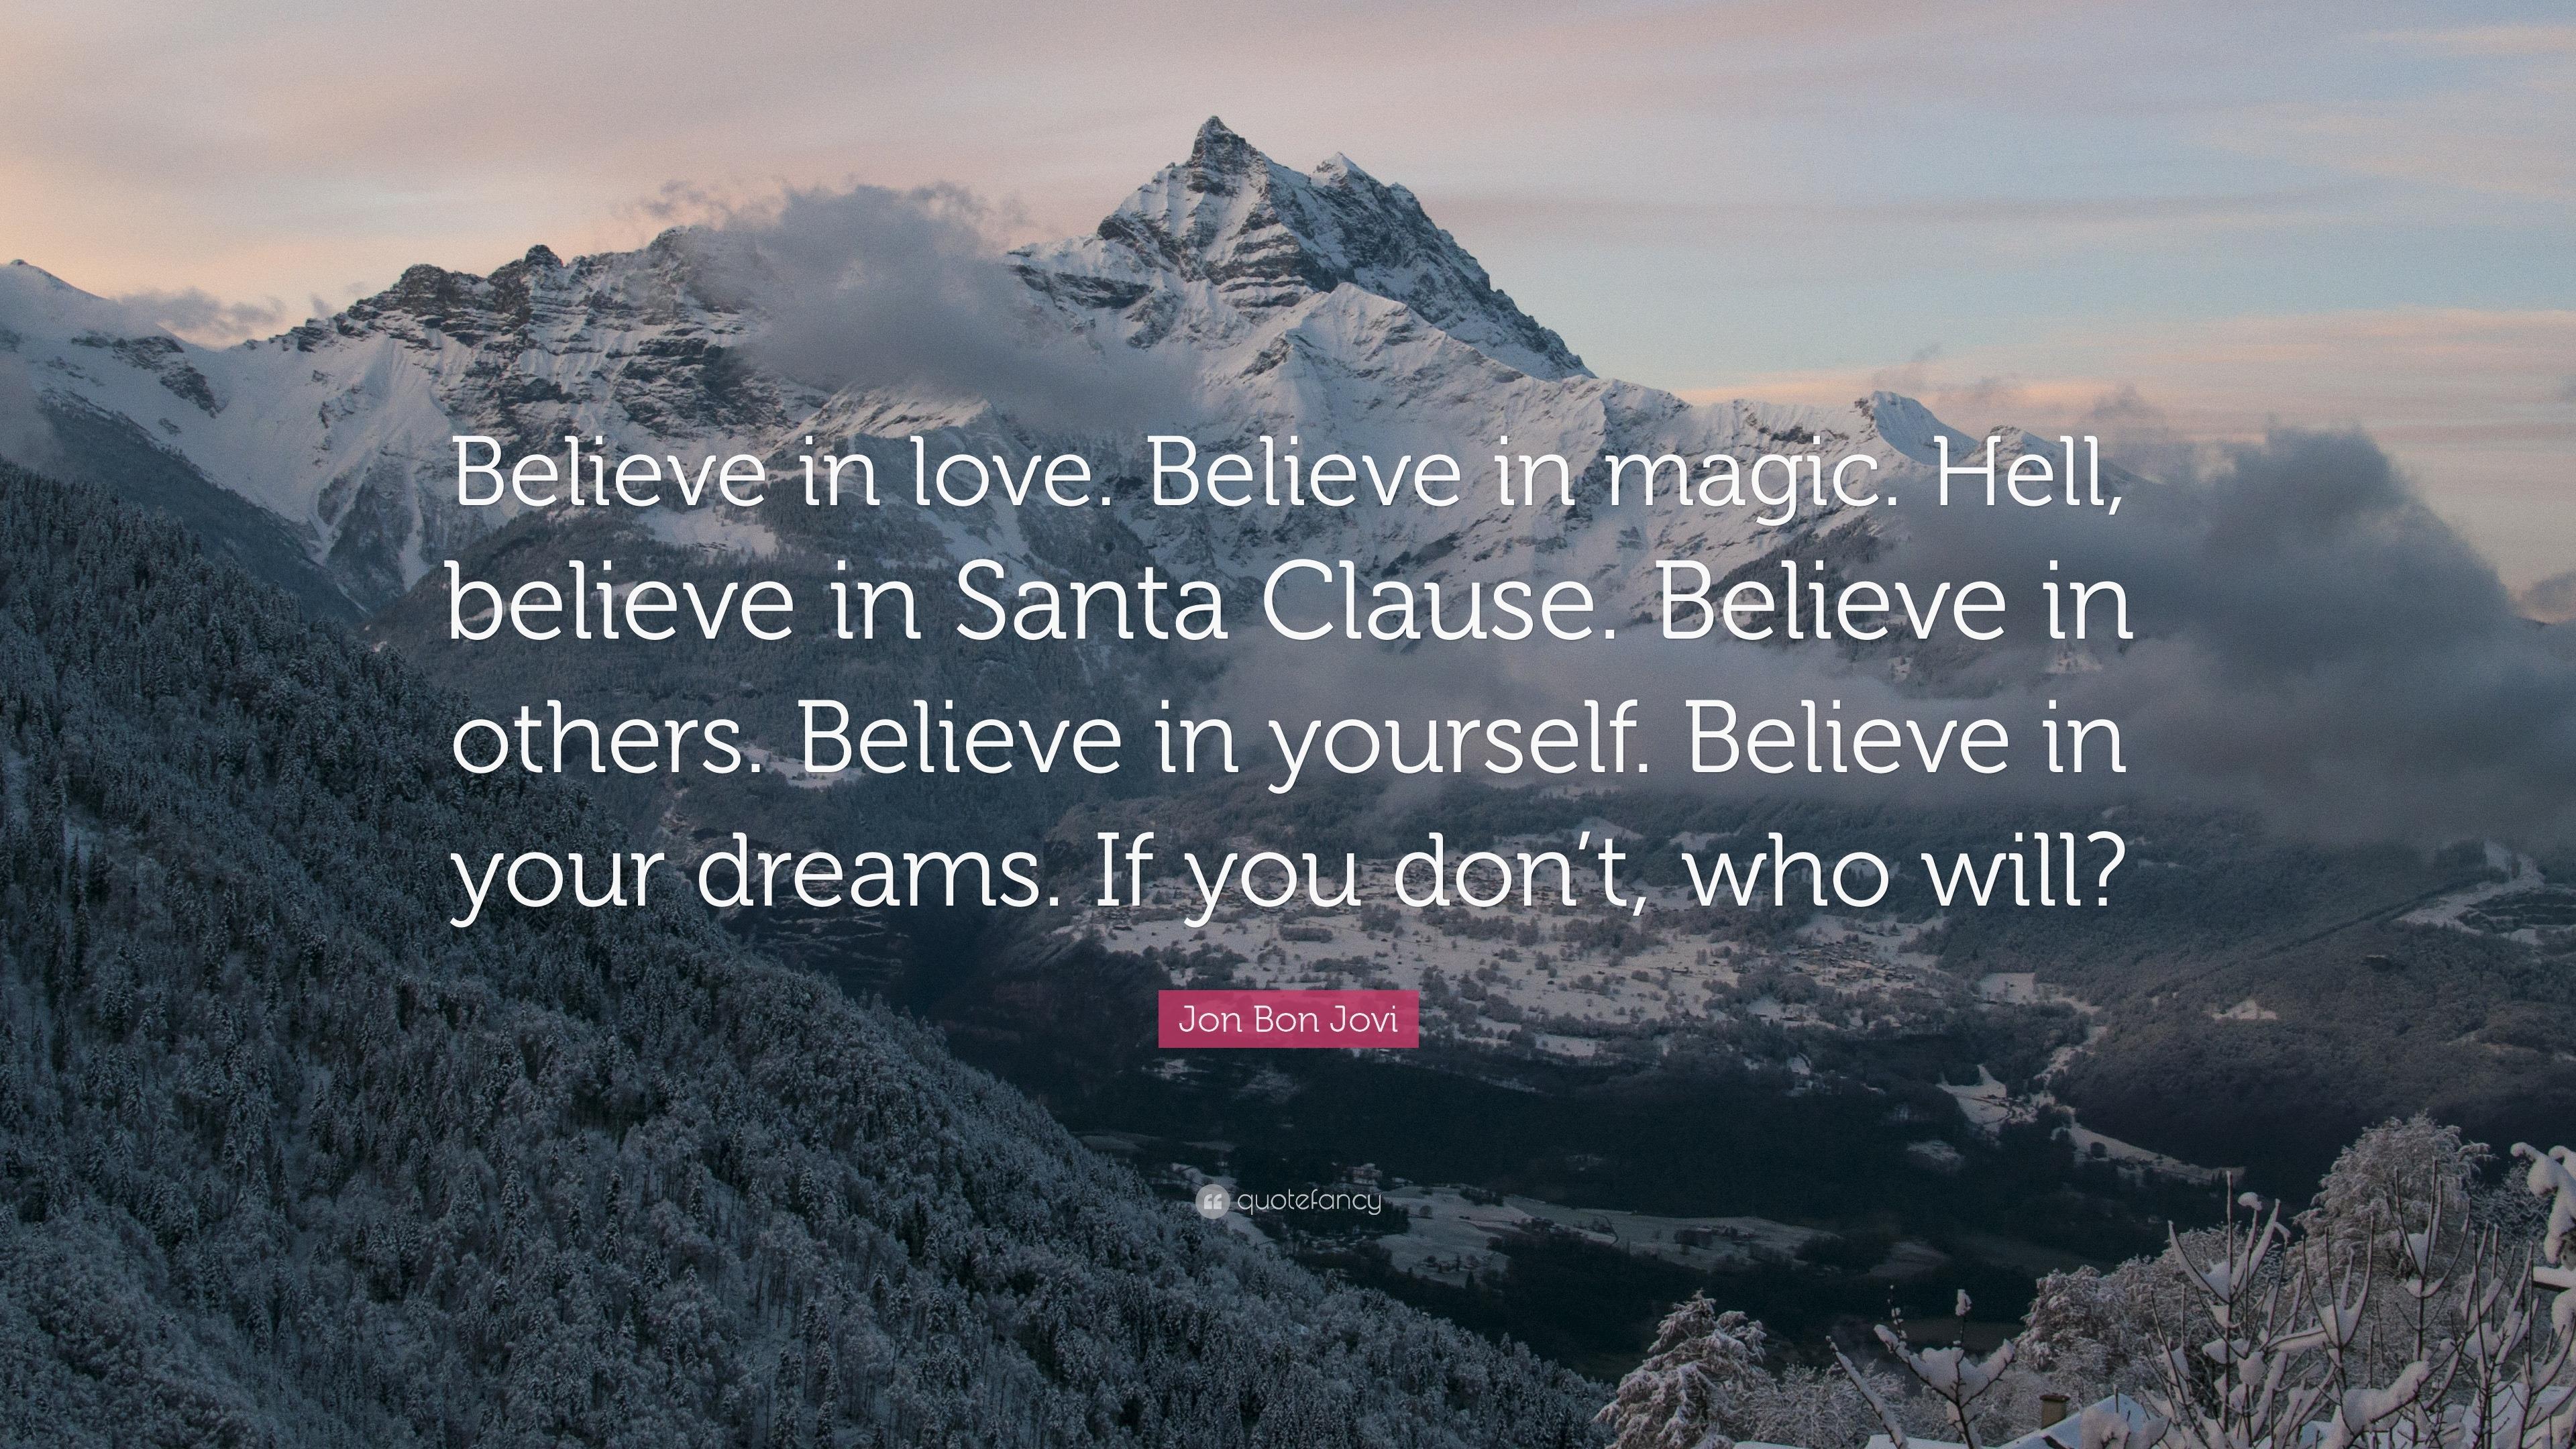 Jon Bon Jovi Quote: U201cBelieve In Love. Believe In Magic. Hell,